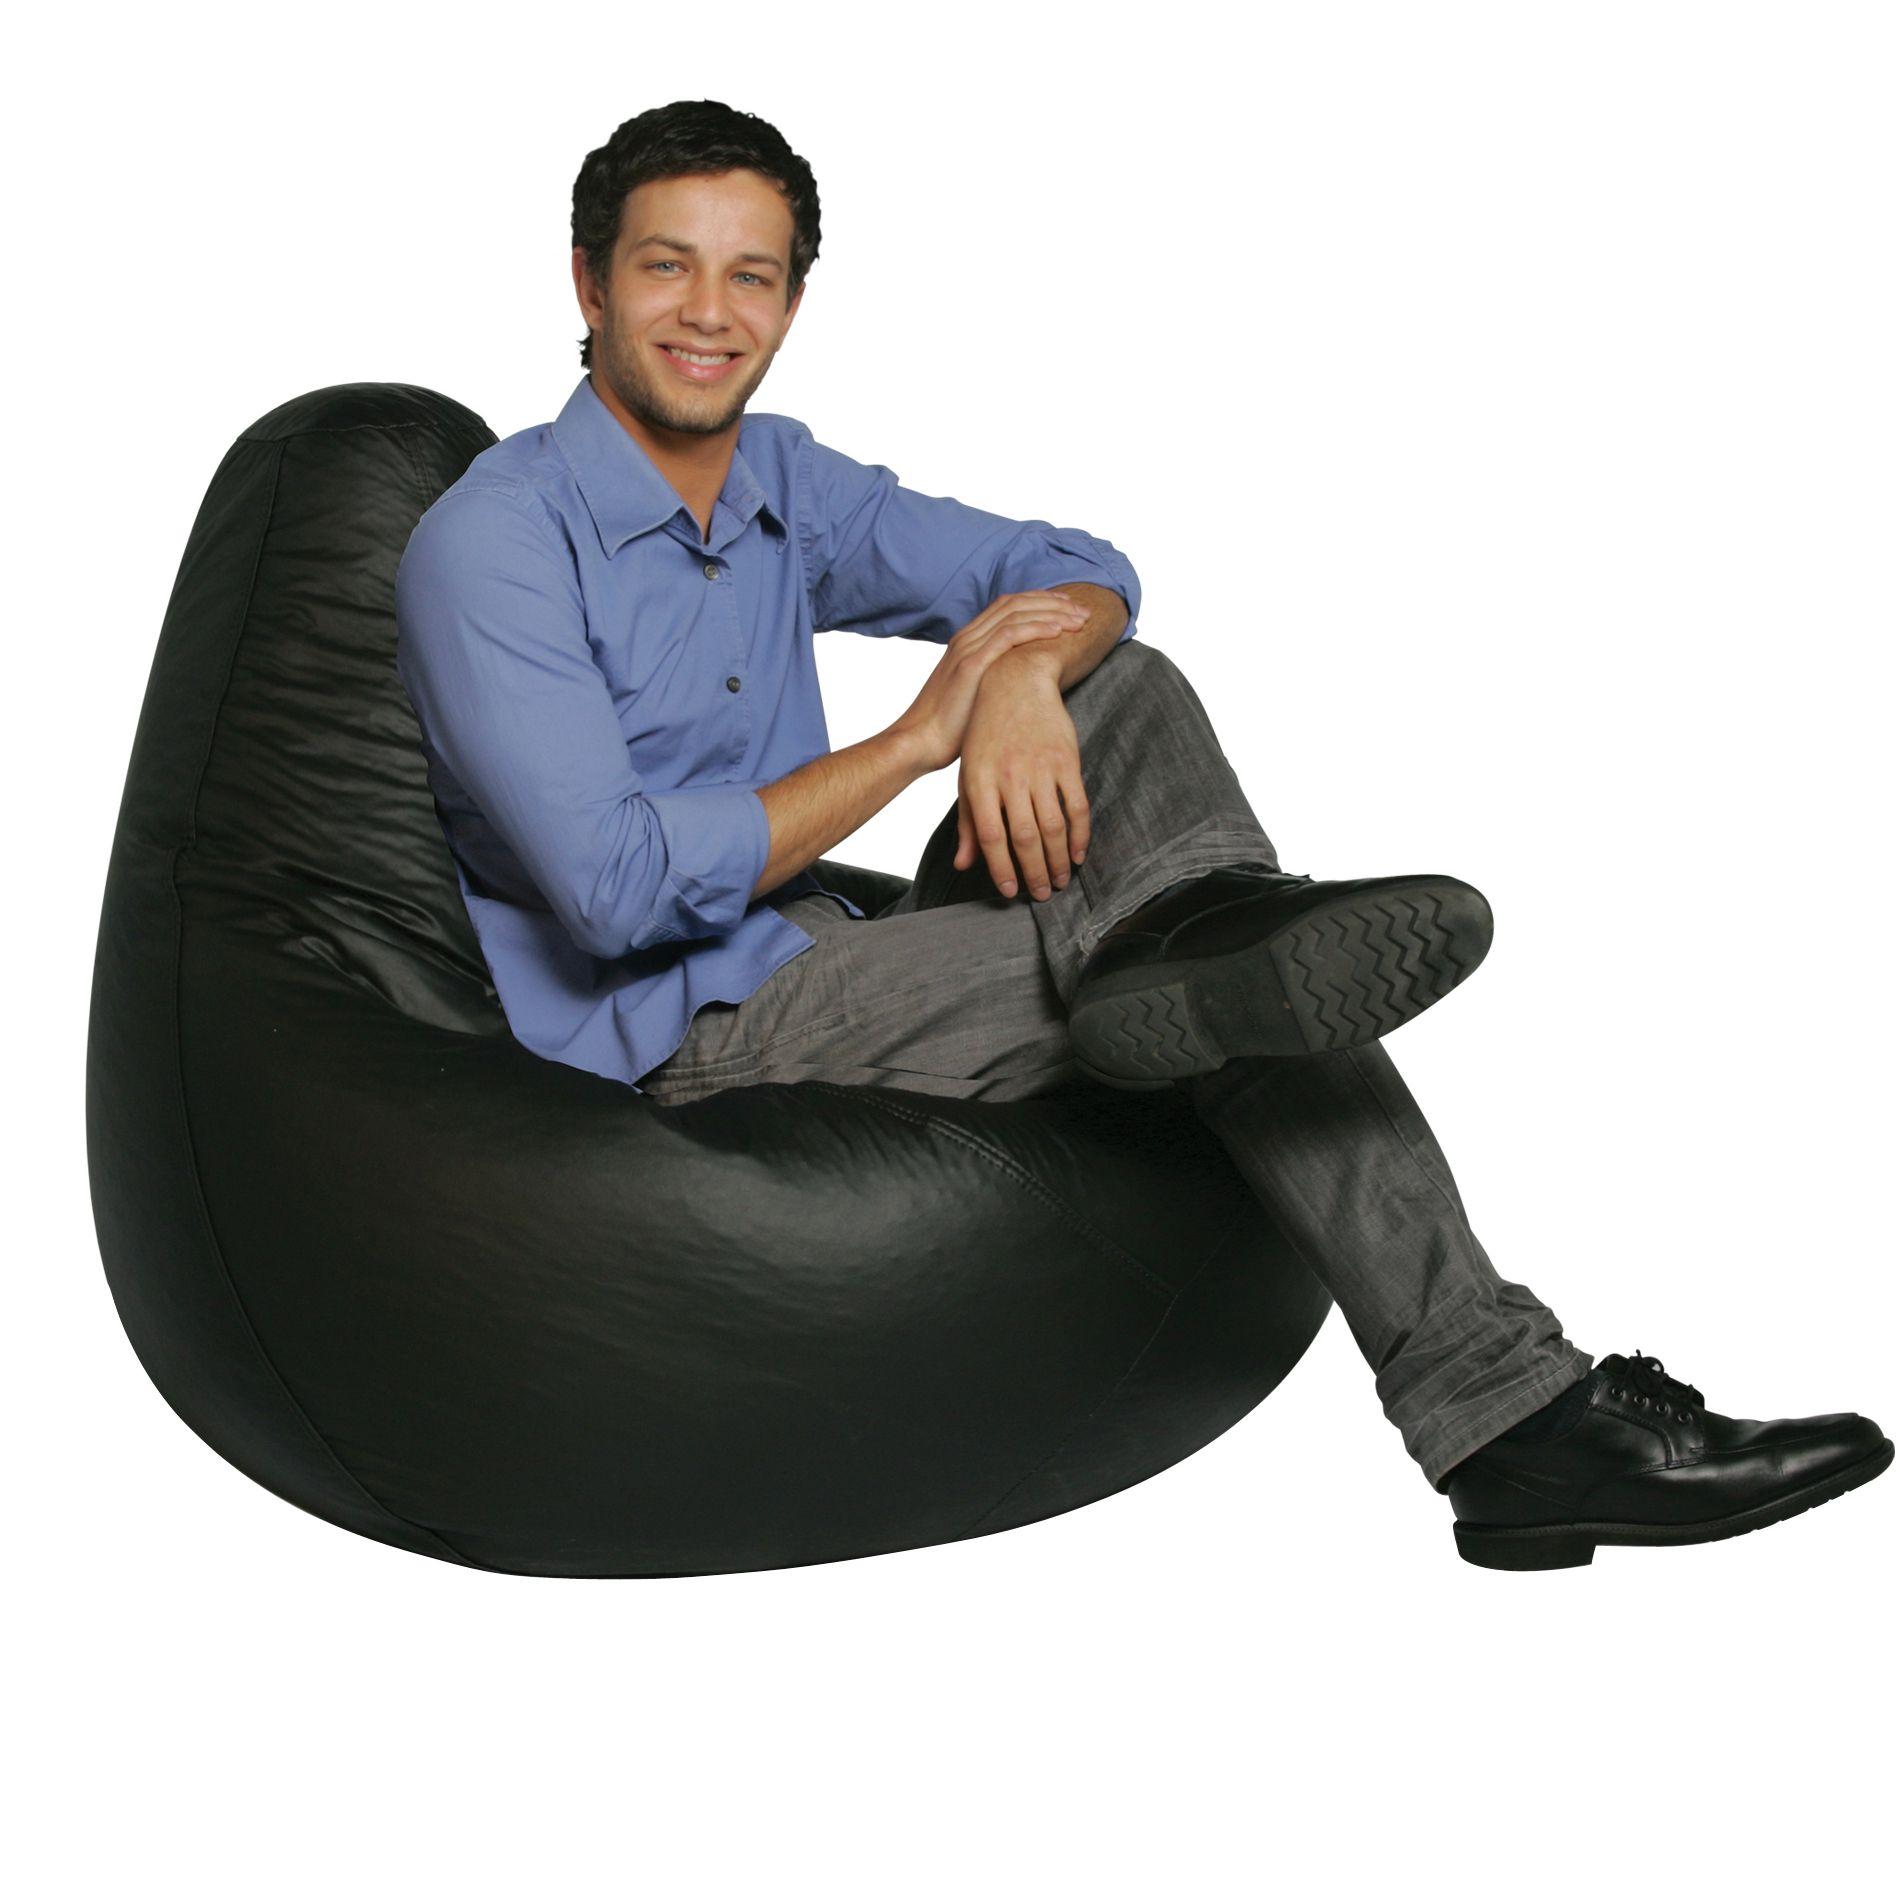 Bean Bag Factory Adult Black Vinyl Bean Bag Chair Skin